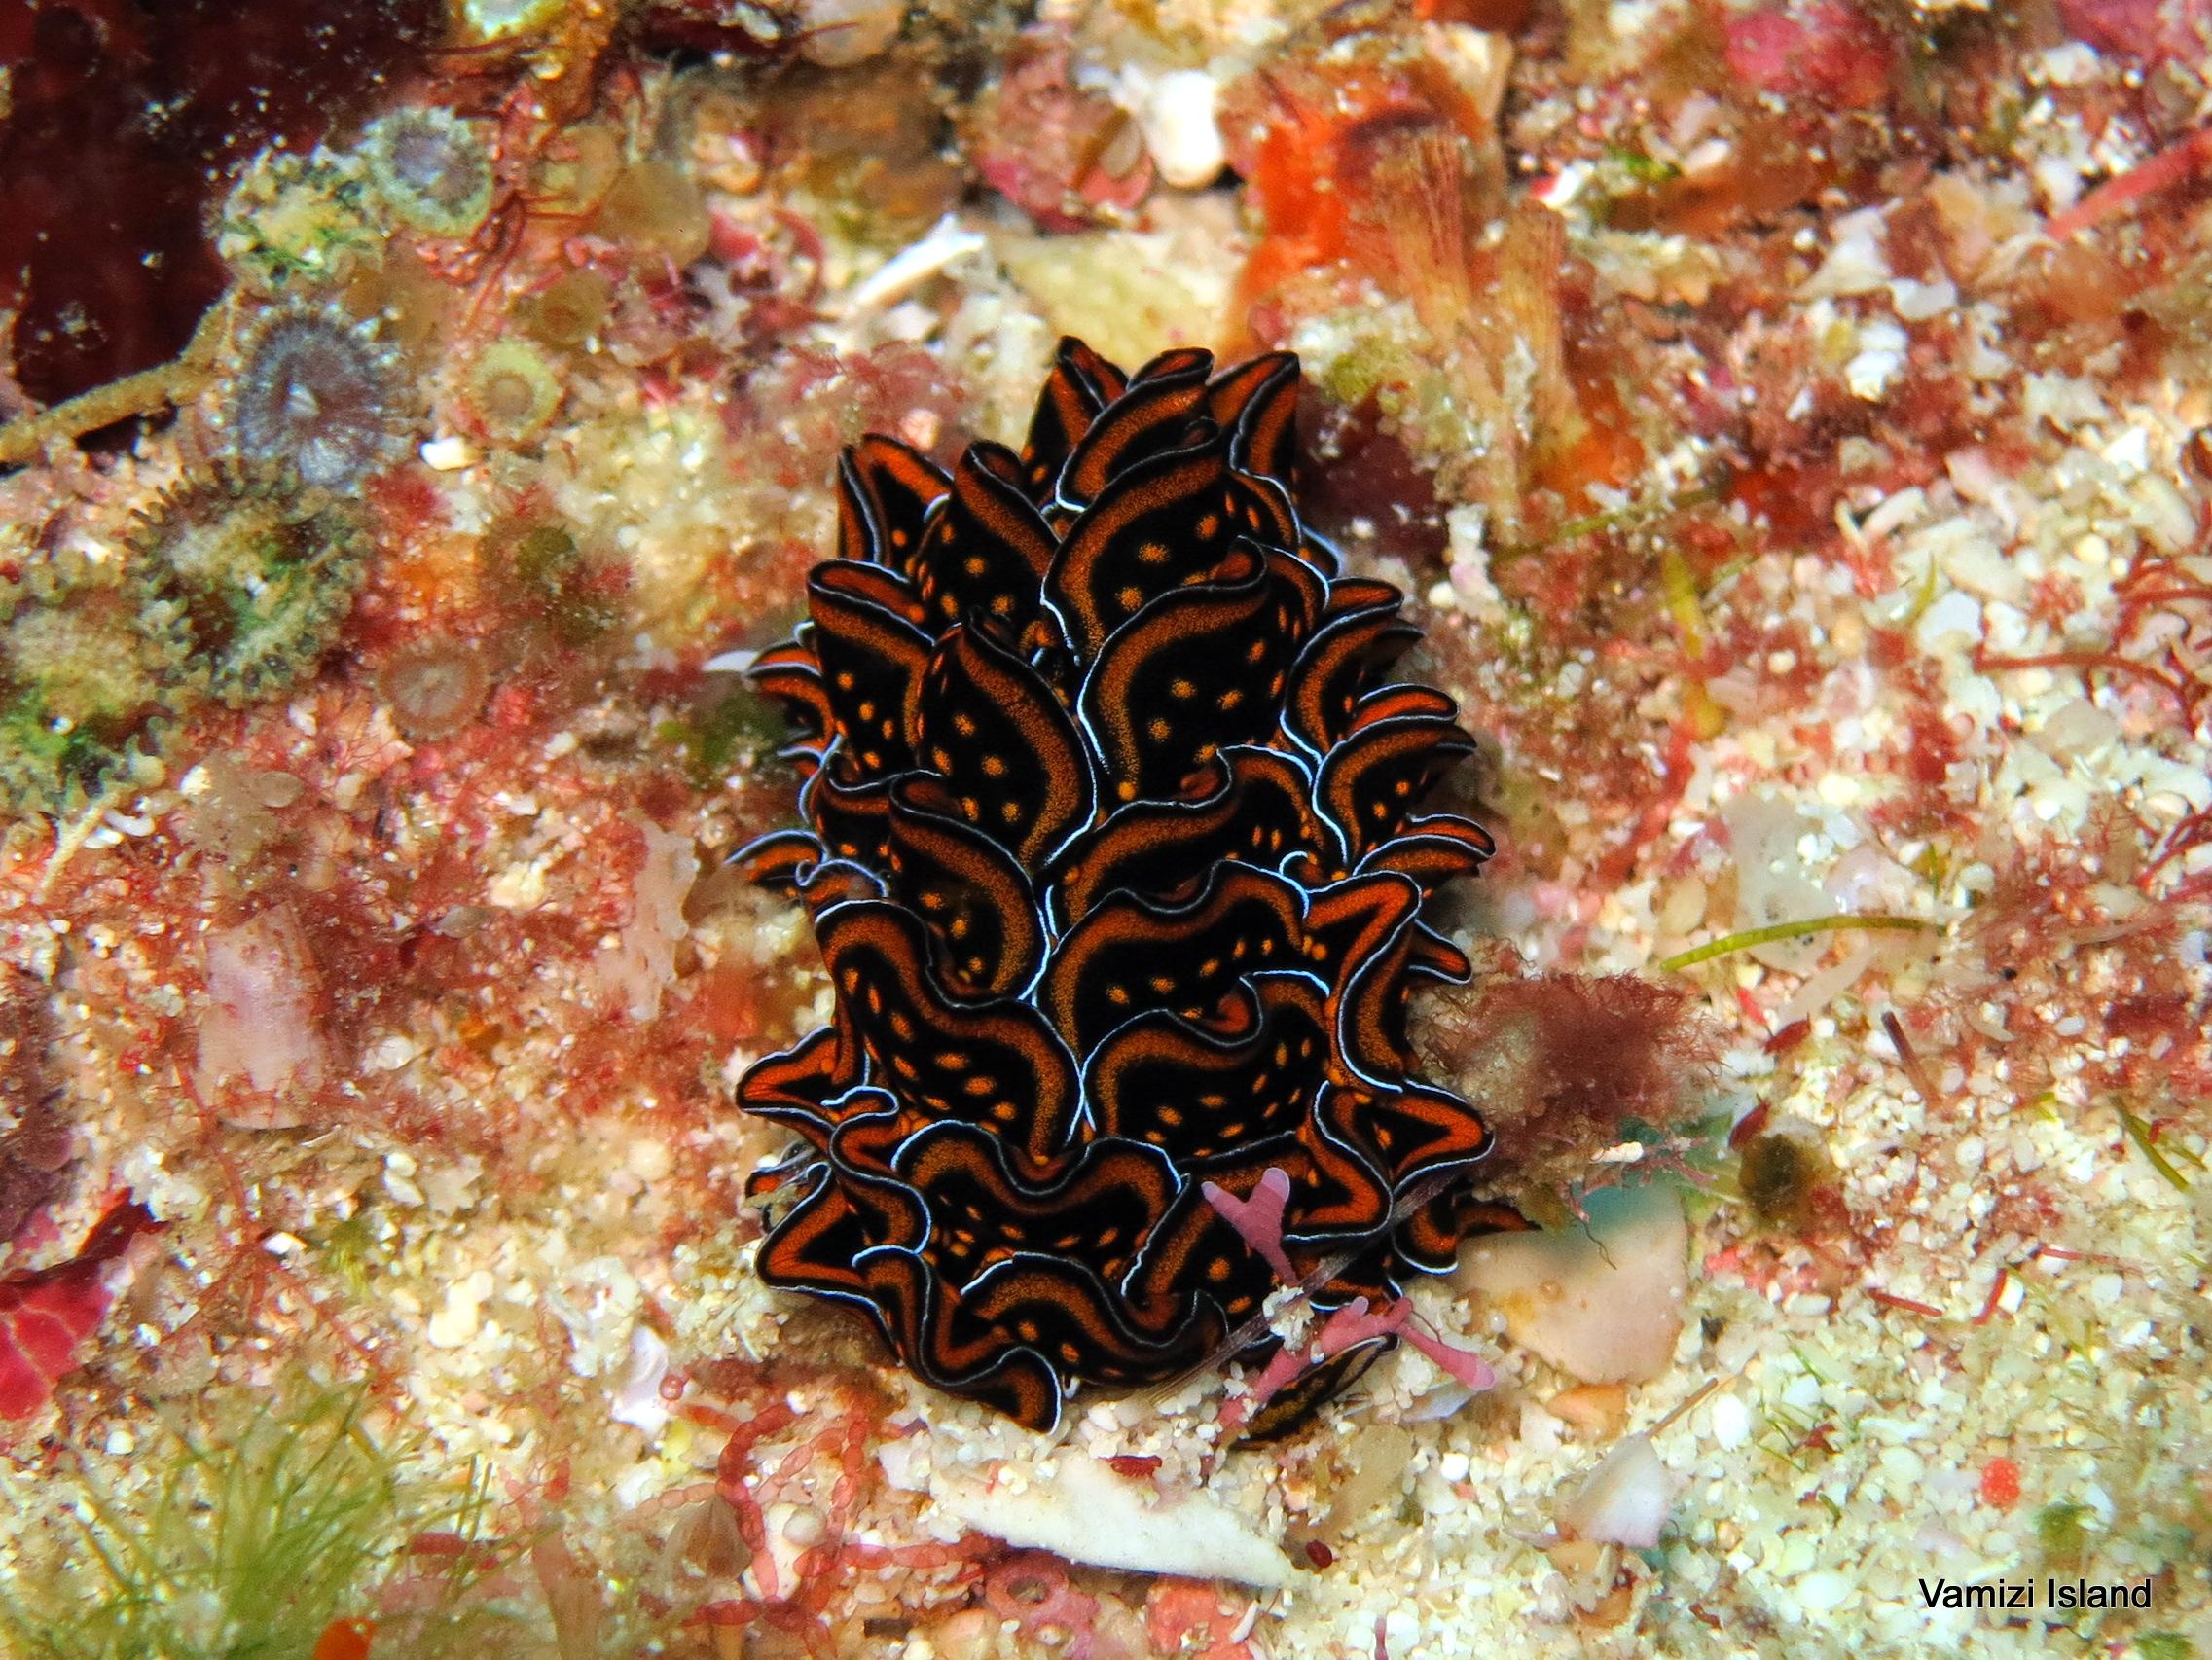 Vamizi_IndianOcean_sea slugs